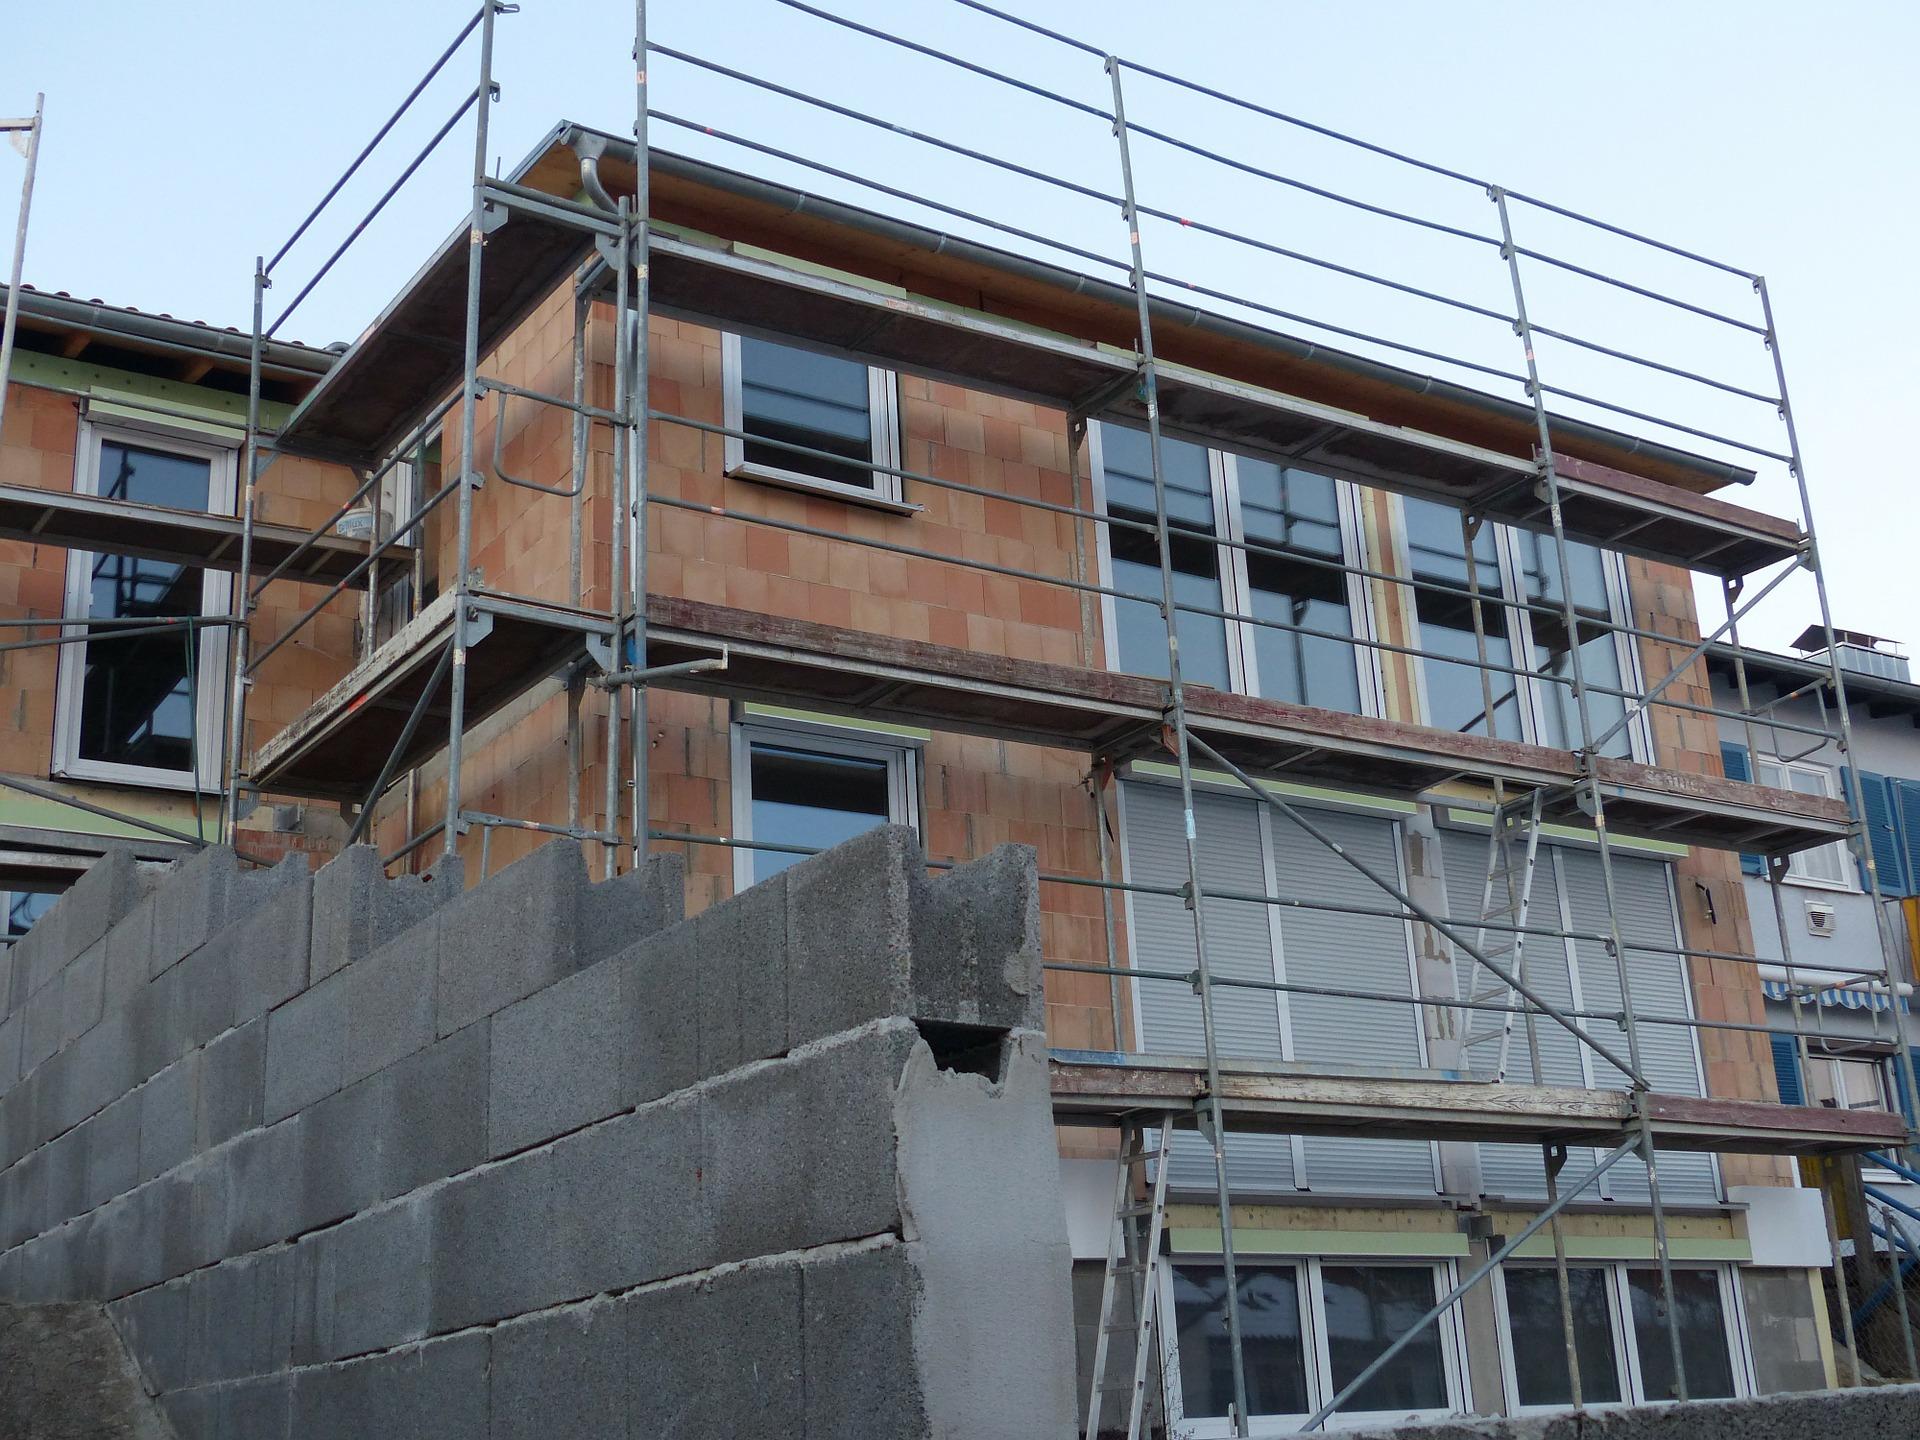 baustelle-gerüst-renovieren-umbauen-nwb immobilien